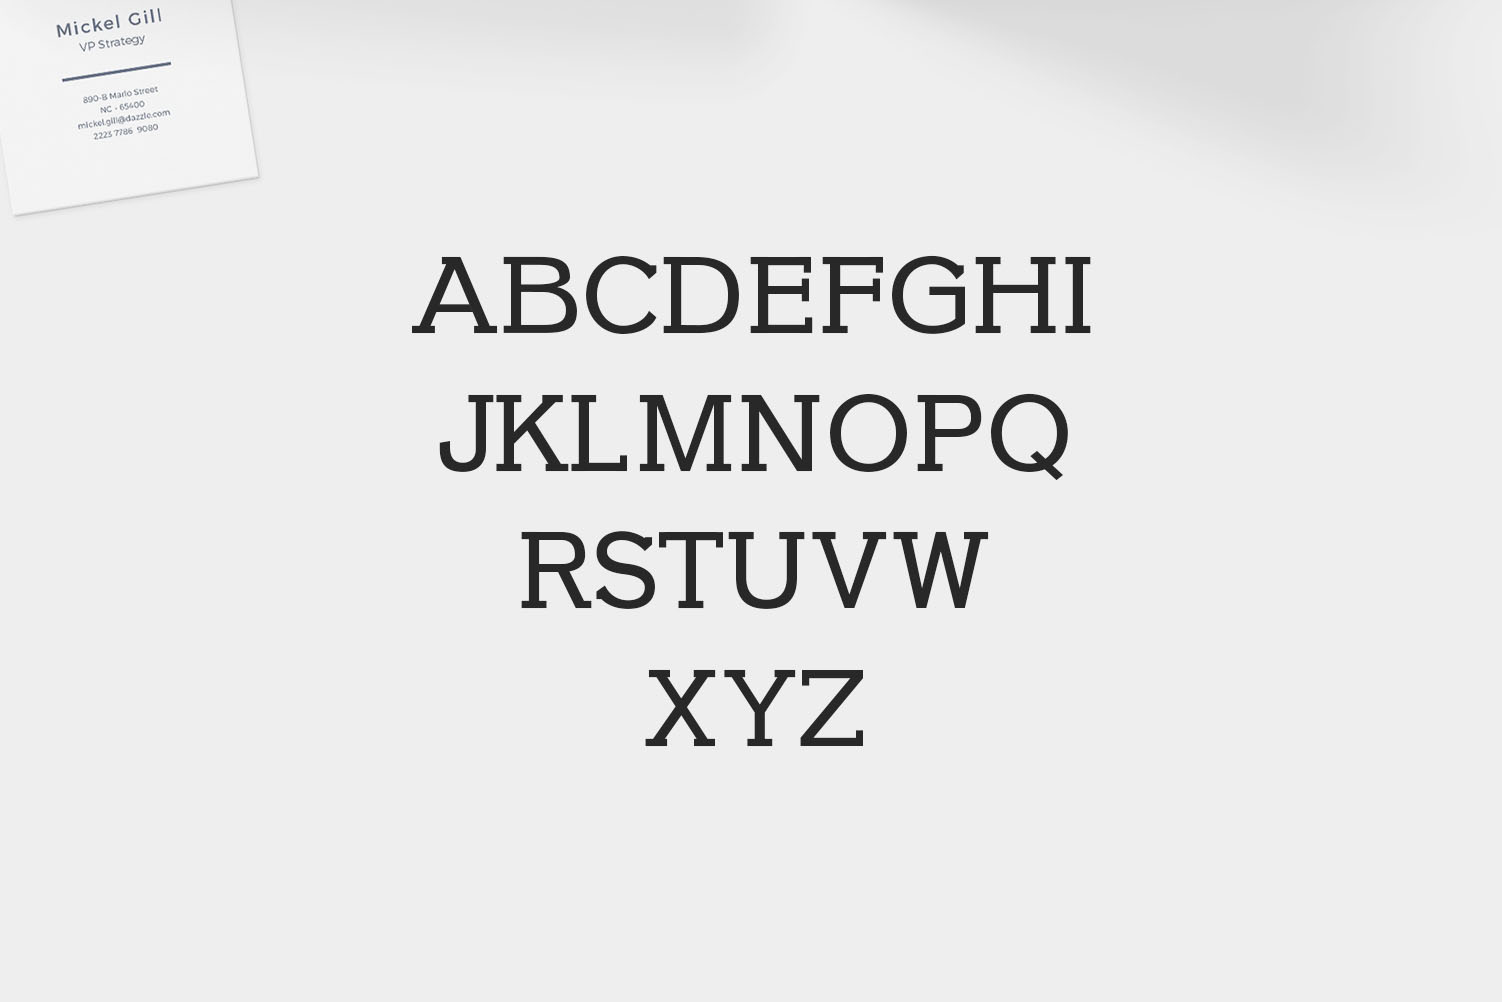 Farhan Slab Serif 5 Font Pack example image 2